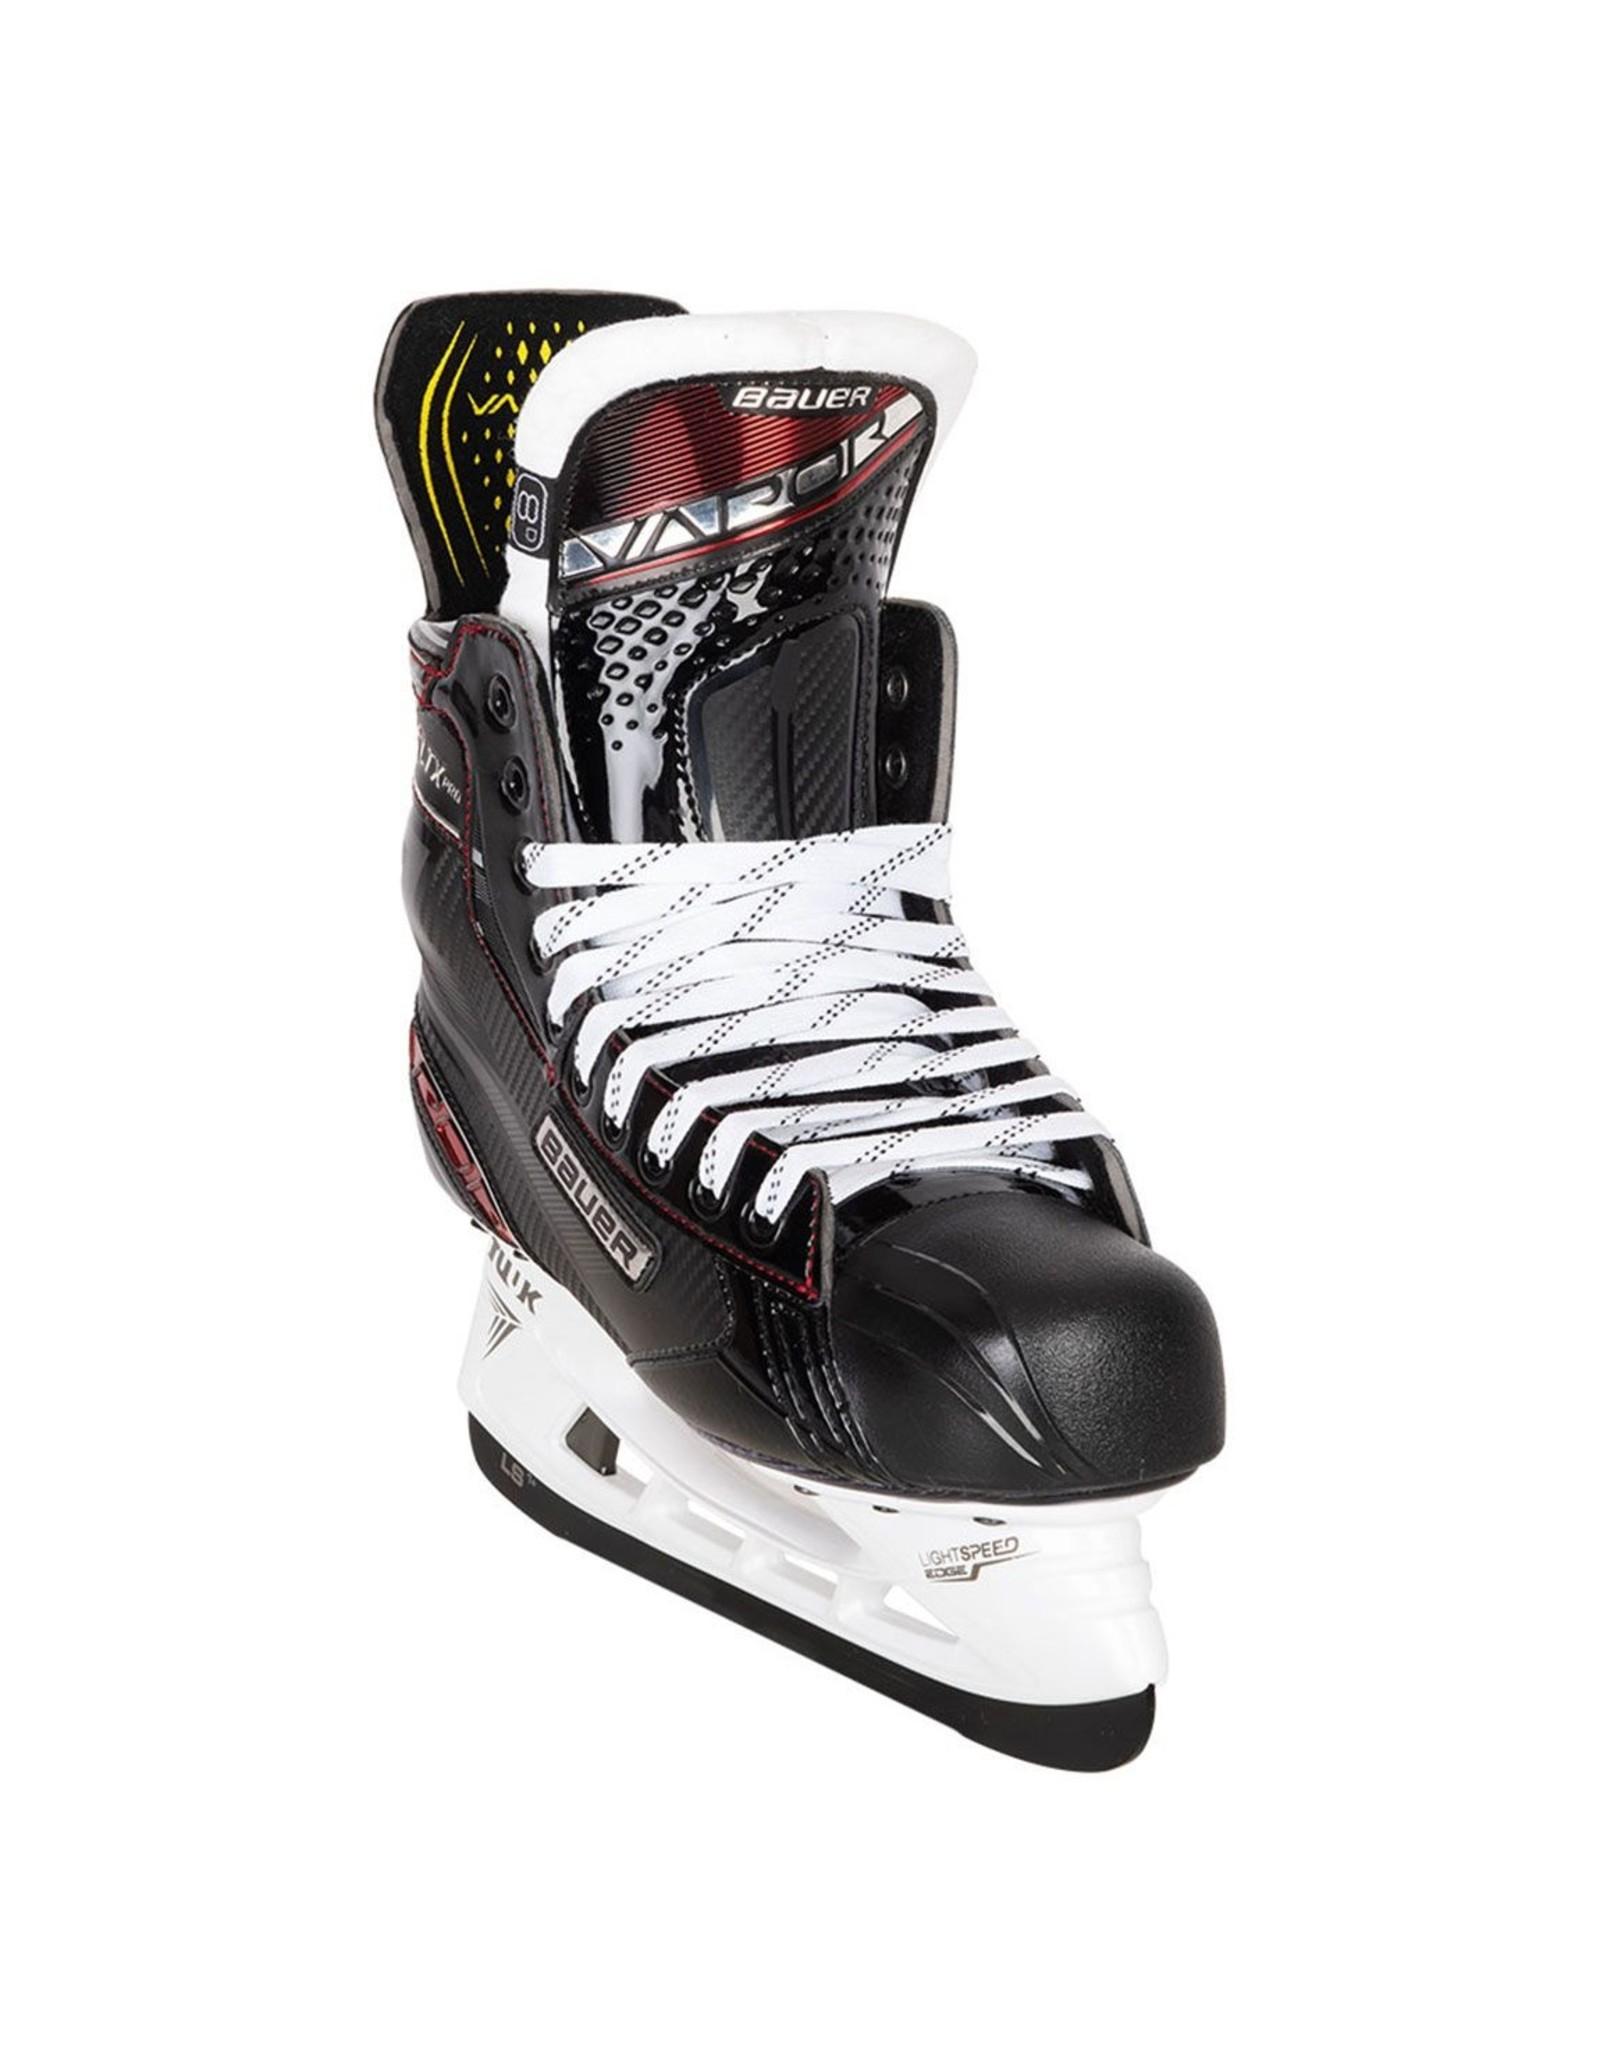 Bauer Hockey - Canada BAUER VAPOR XLTX PRO SKATE '19 - JR